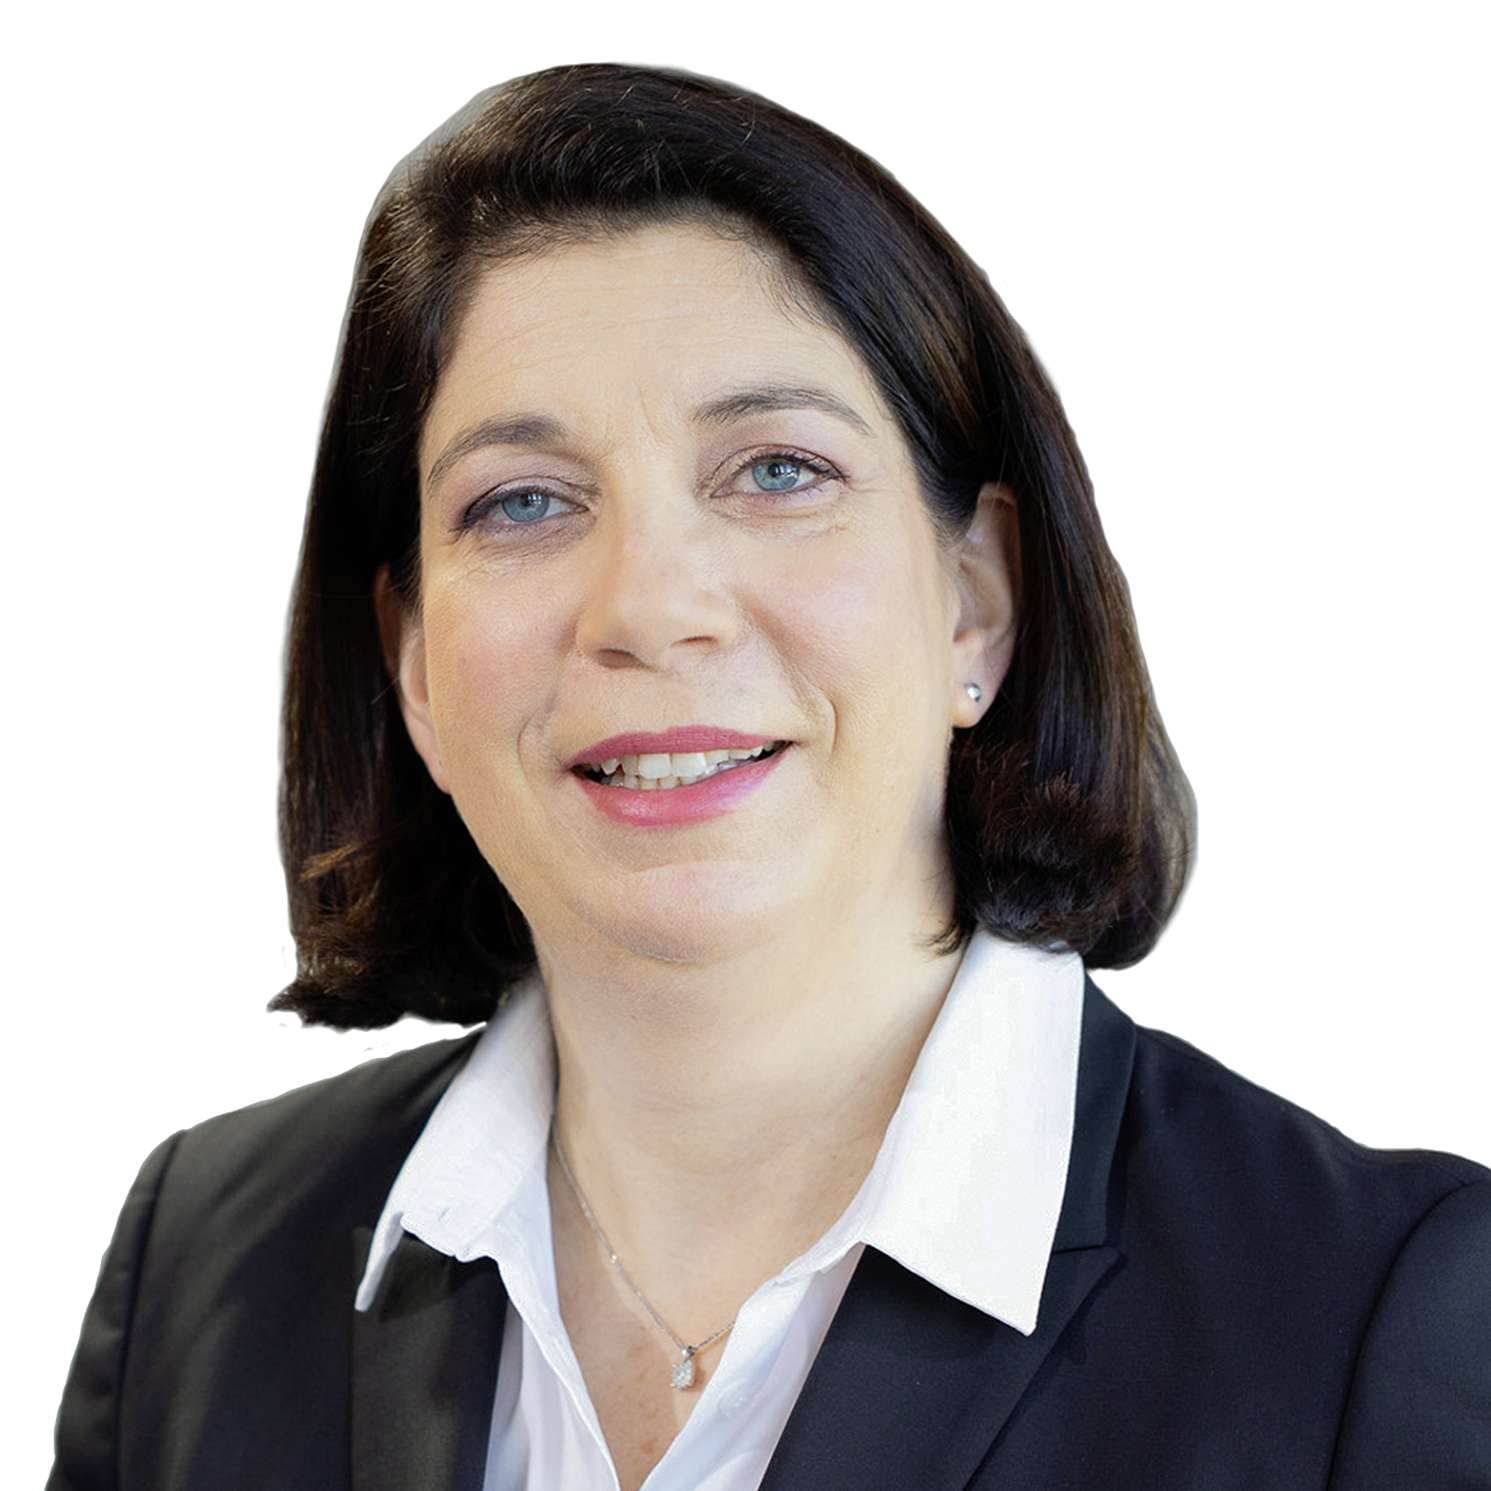 Alexandra Dantmann